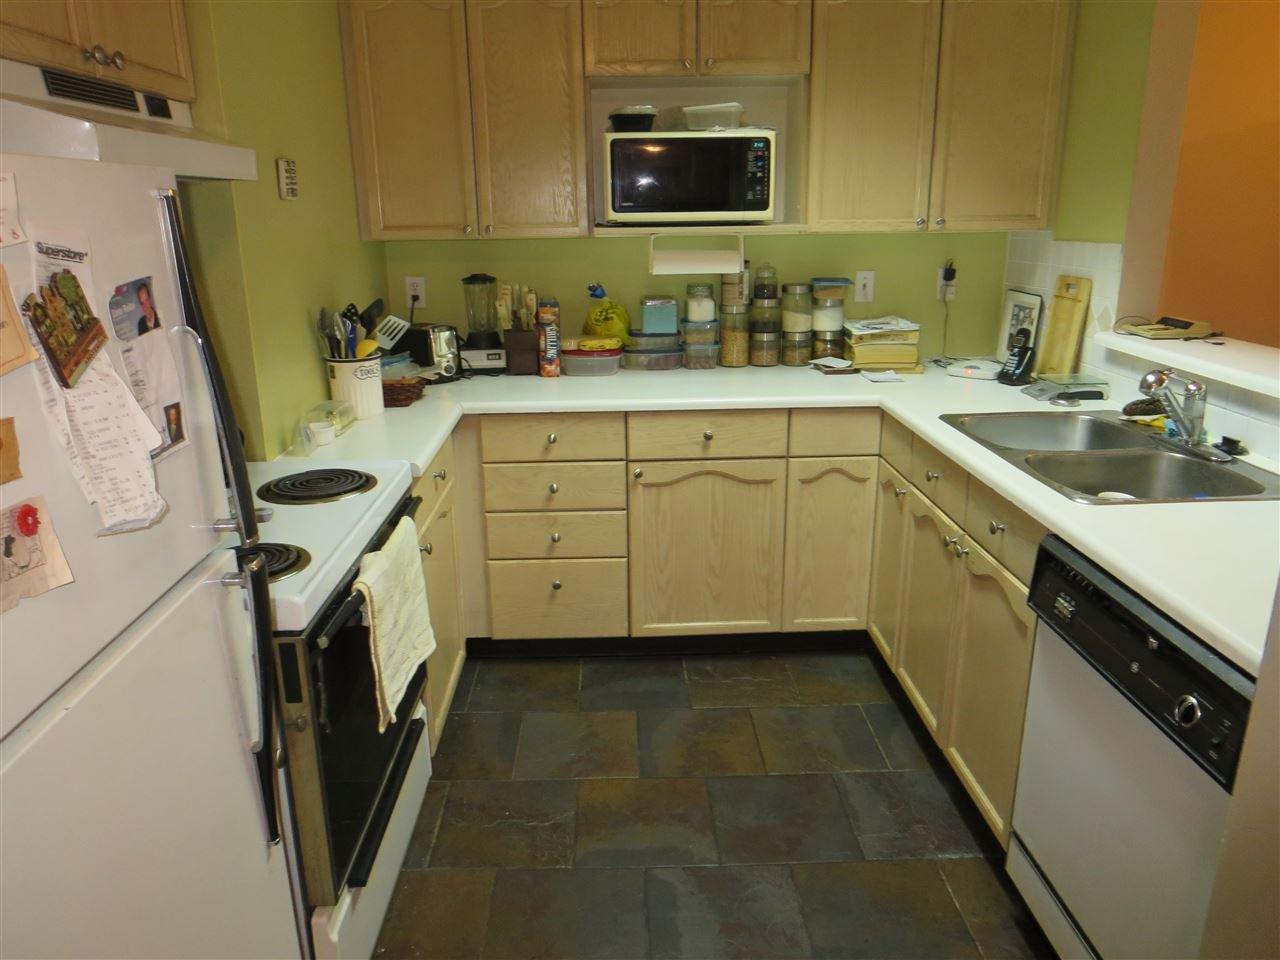 Photo 4: Photos: 317 98 LAVAL Street in Coquitlam: Maillardville Condo for sale : MLS®# R2117700